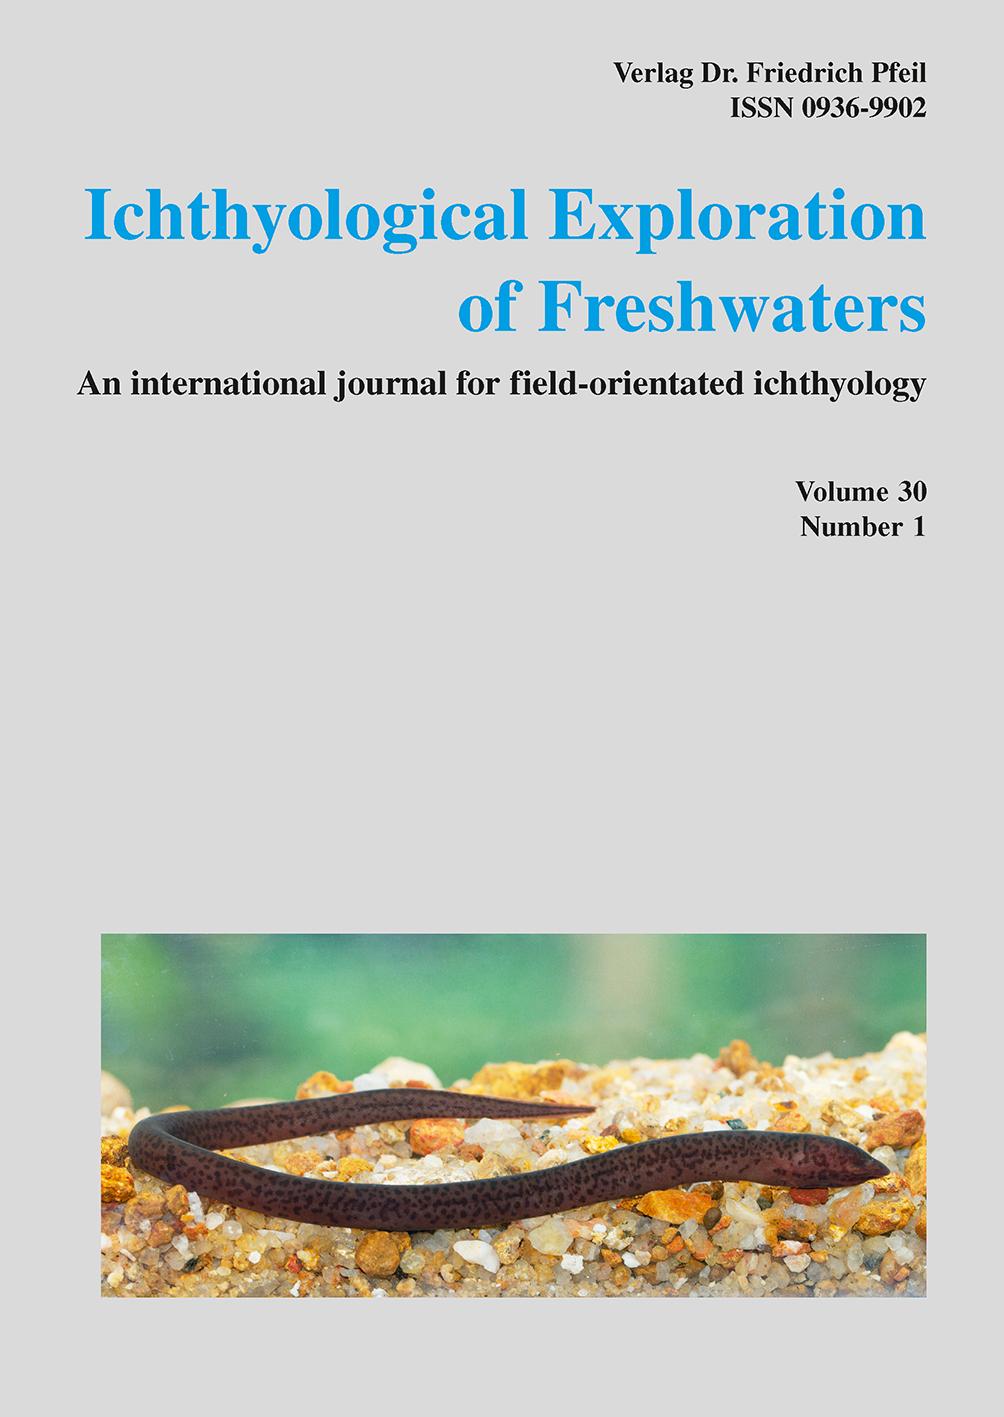 Ichthyological Exploration of Freshwaters, Band 30 (2020)